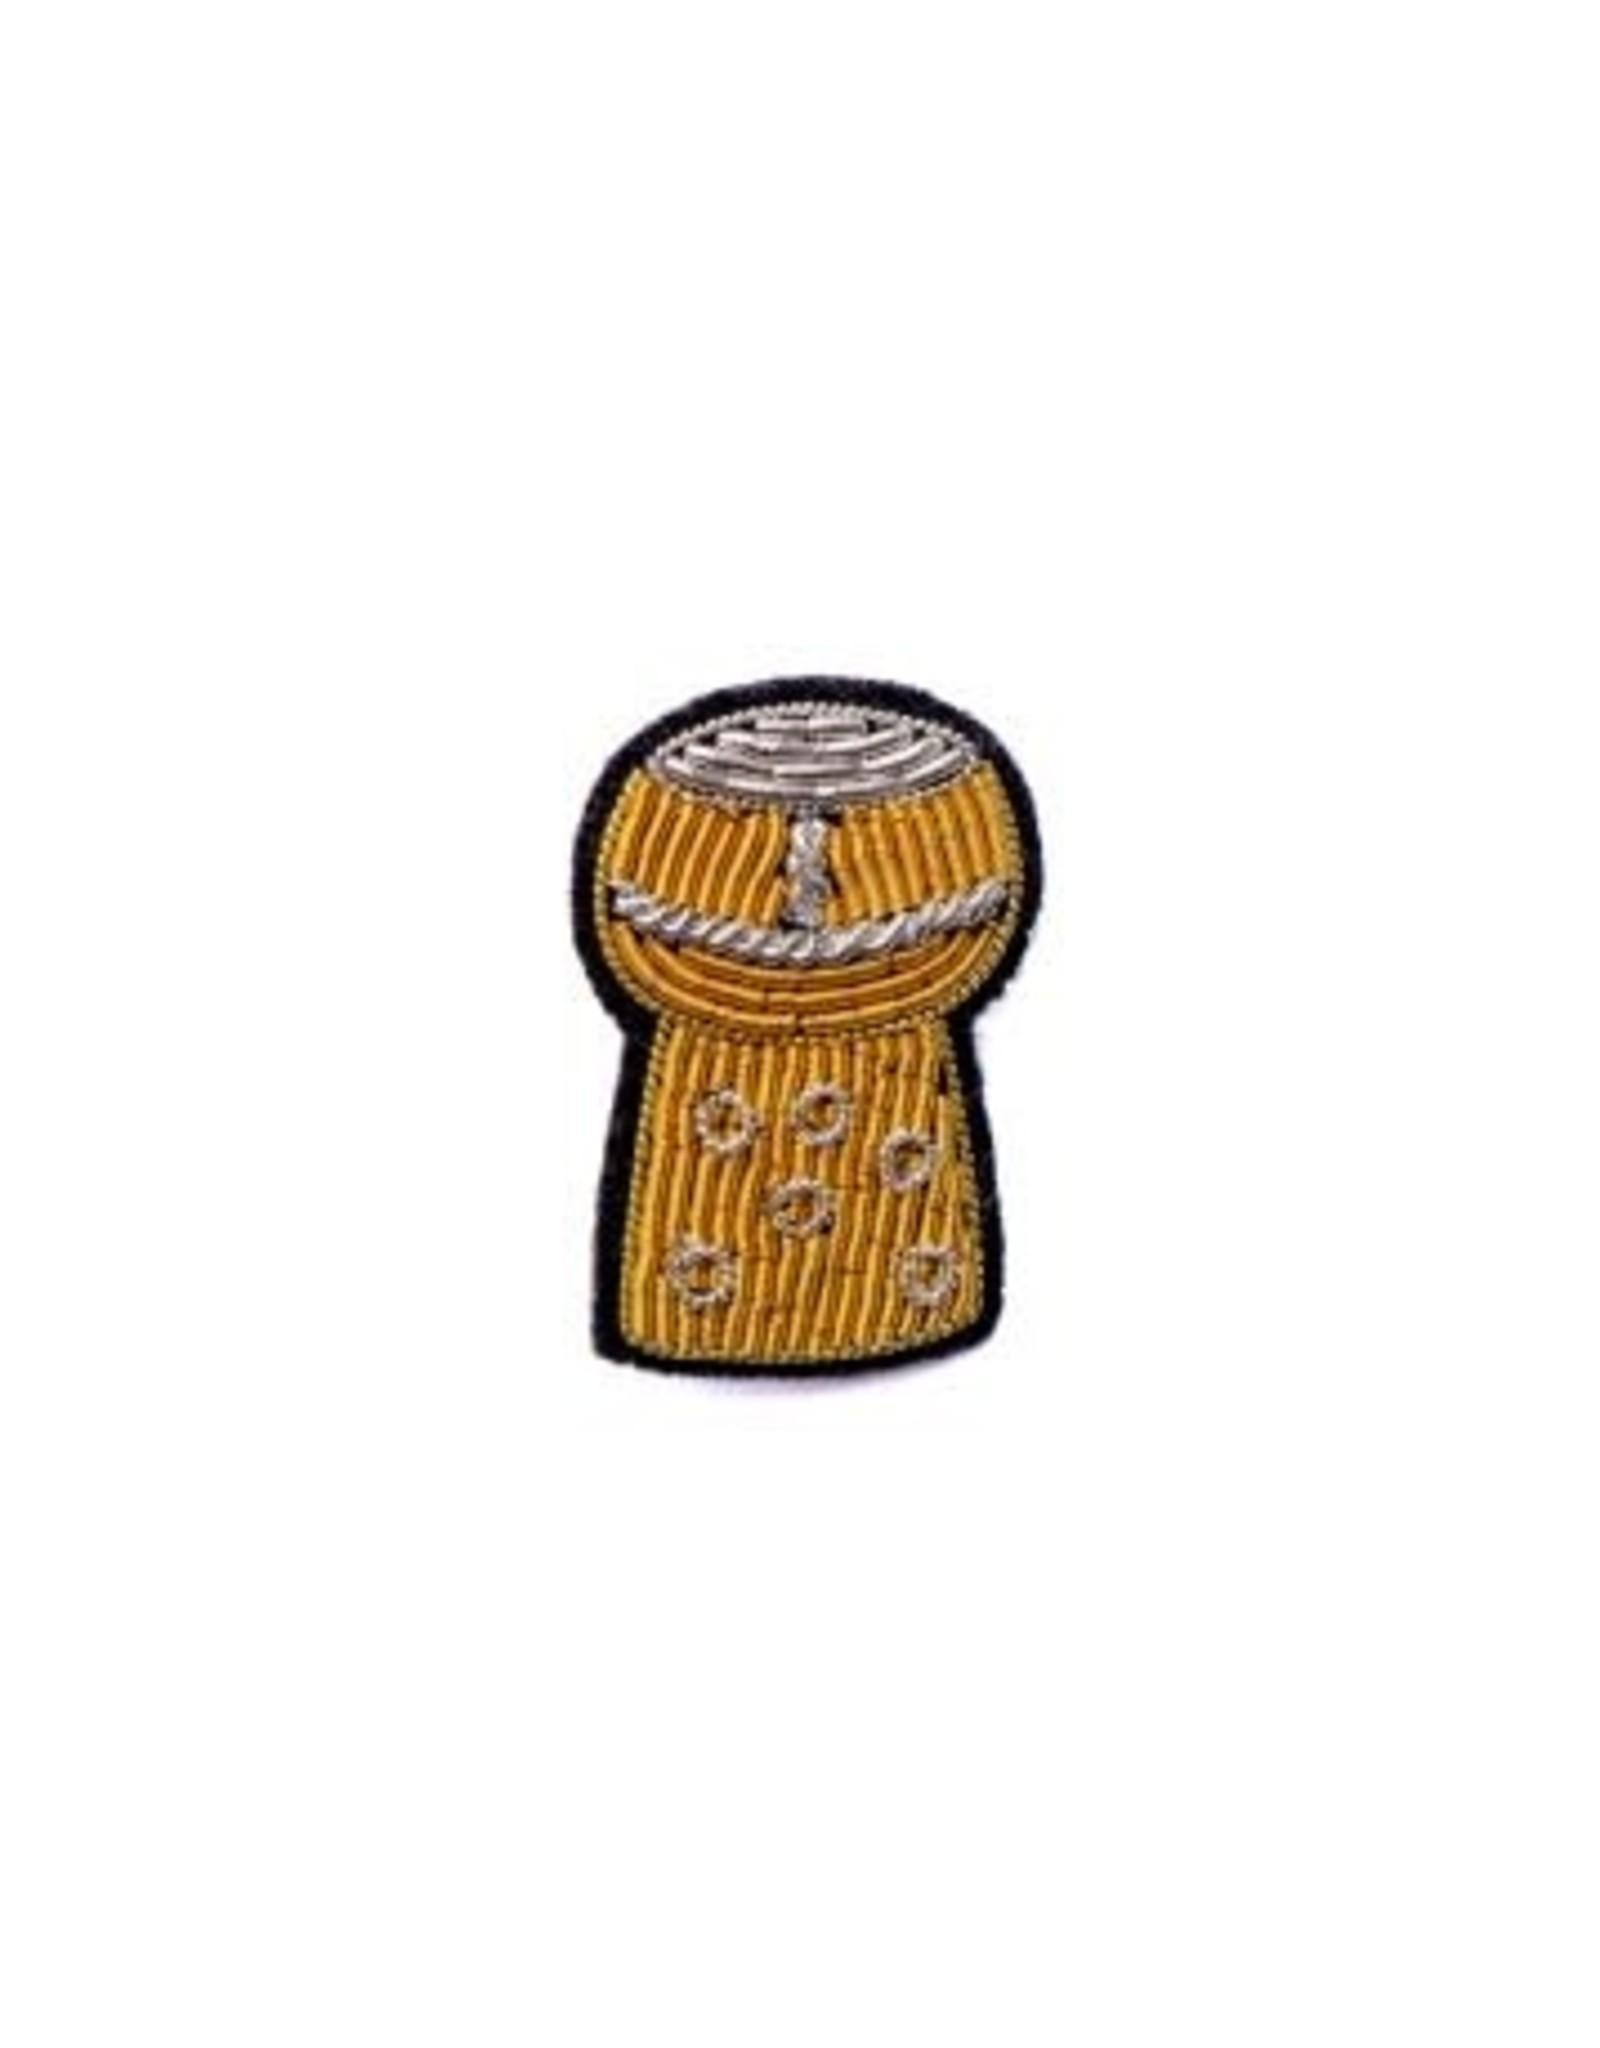 Macon & Lesquoy 'Cork' Pin